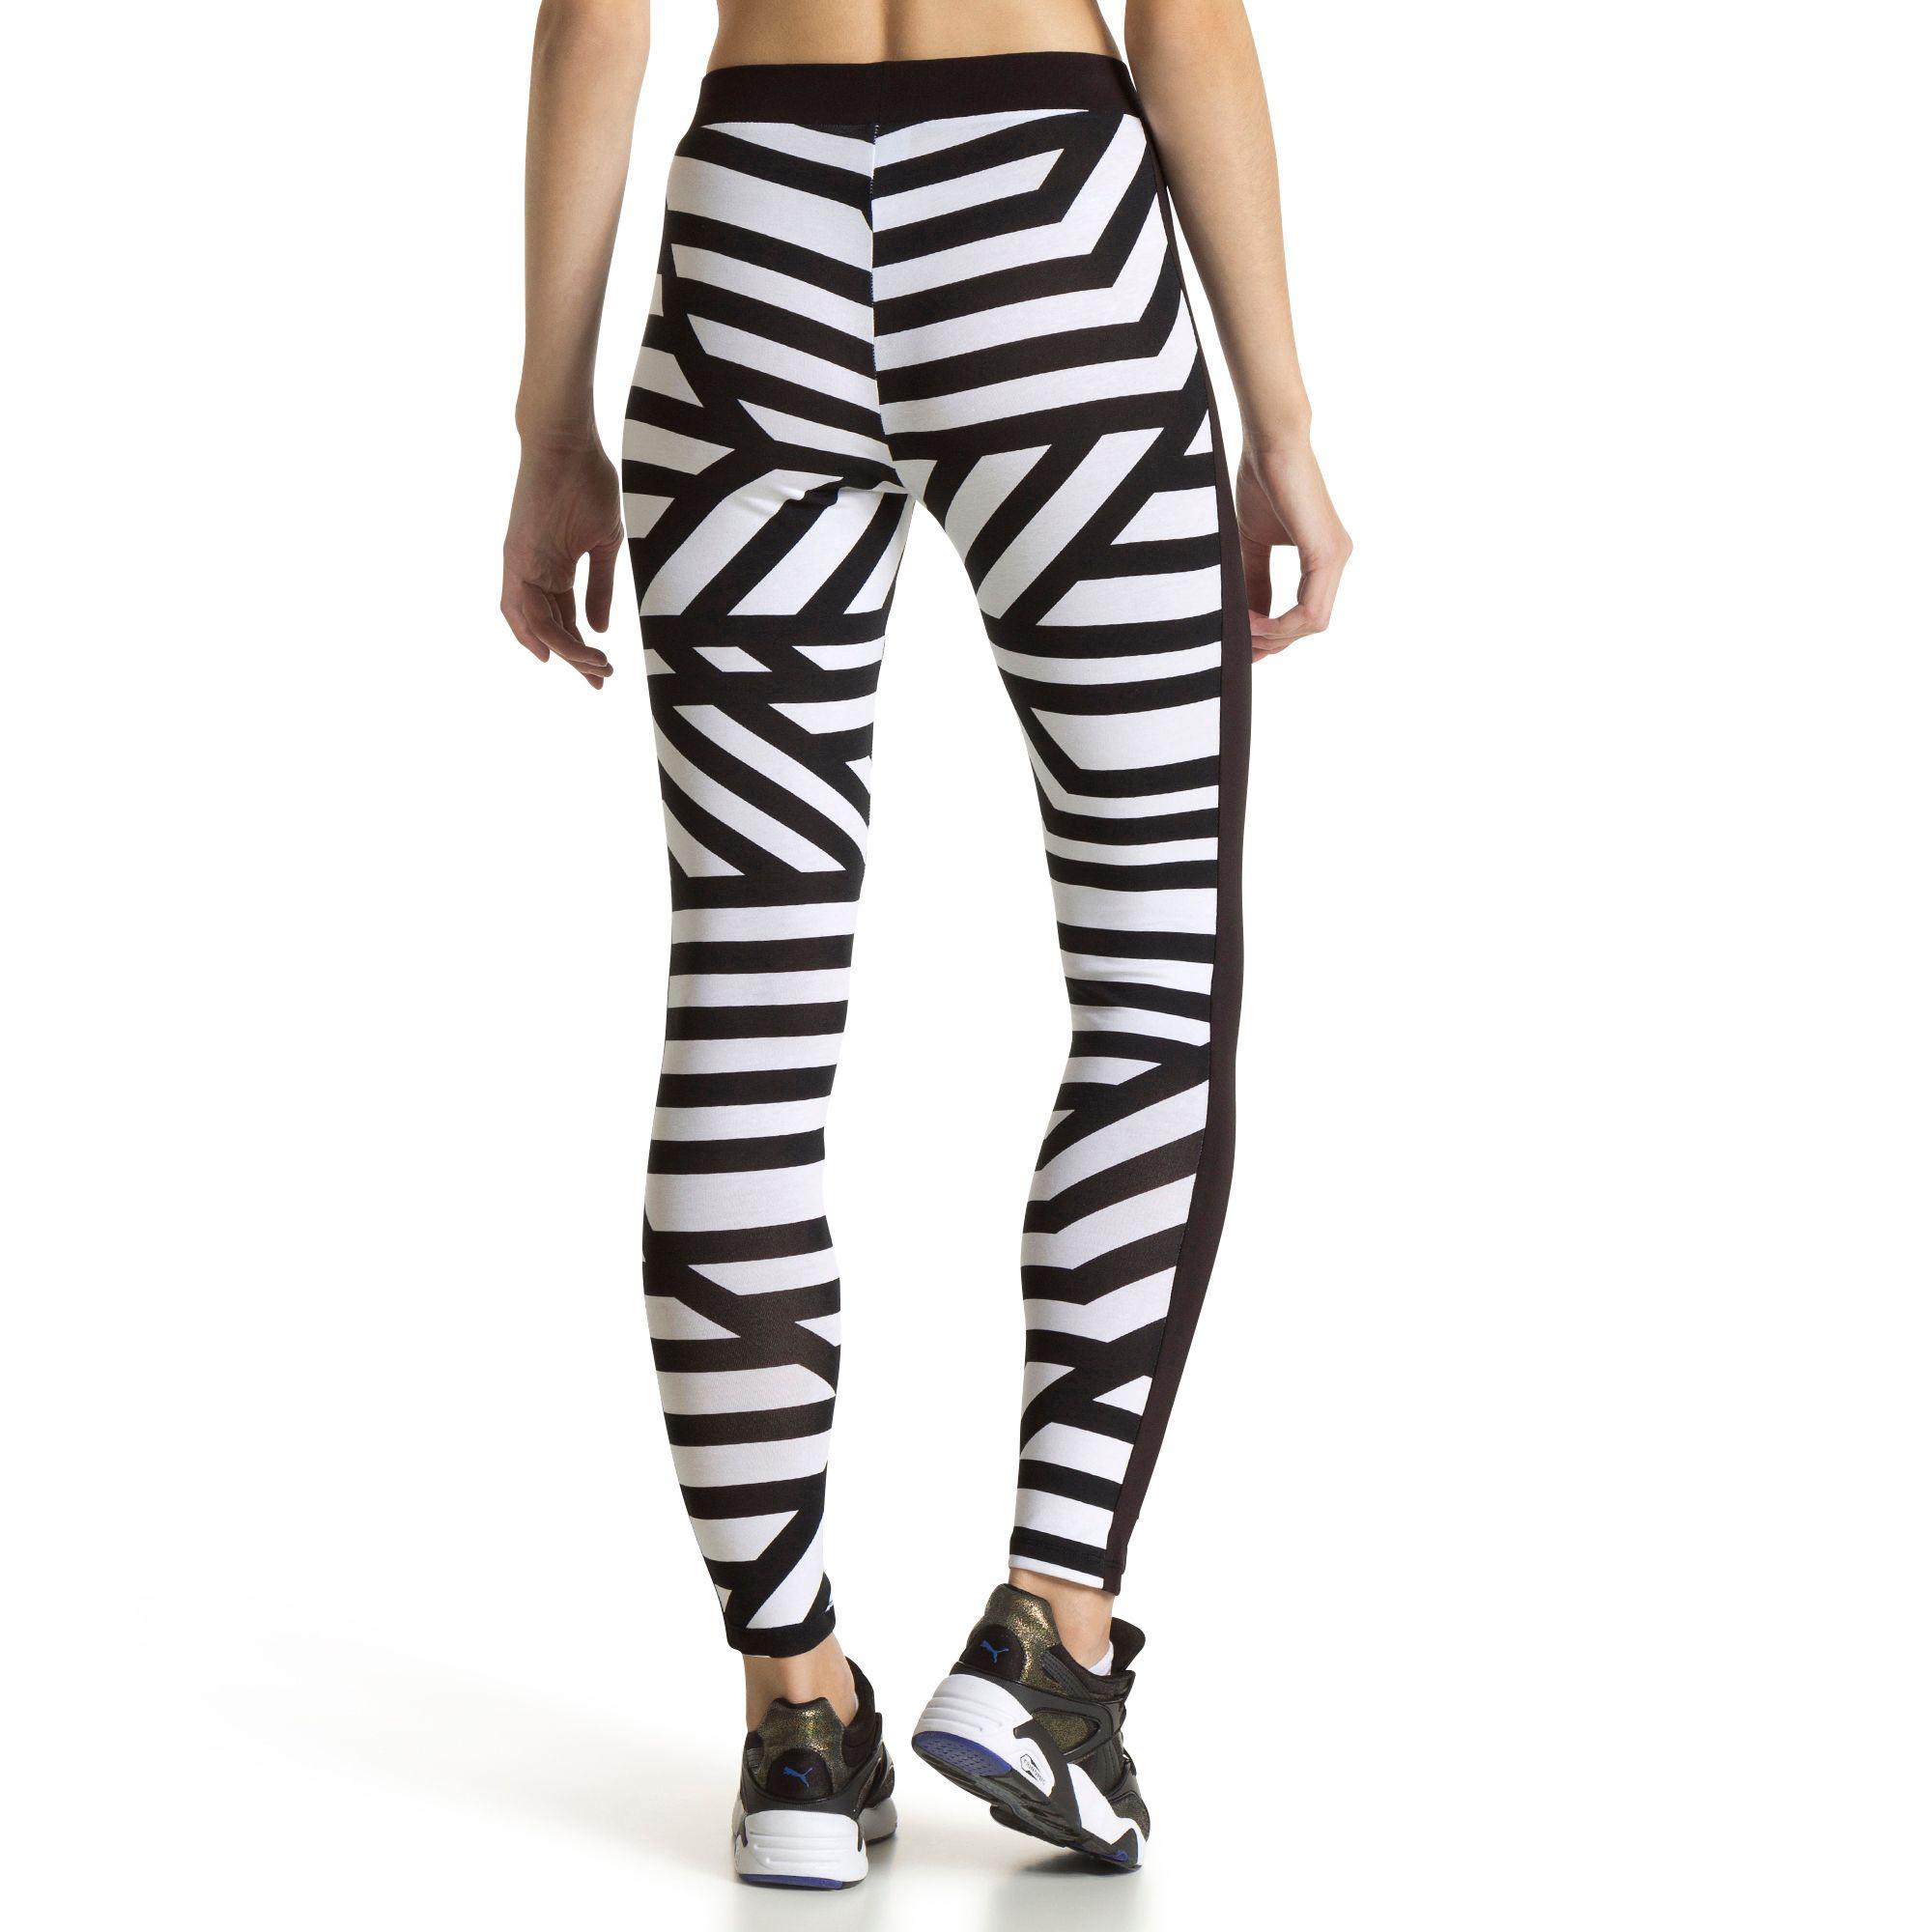 puma damen aop leggings sport classics sporthose frauen neu ebay. Black Bedroom Furniture Sets. Home Design Ideas